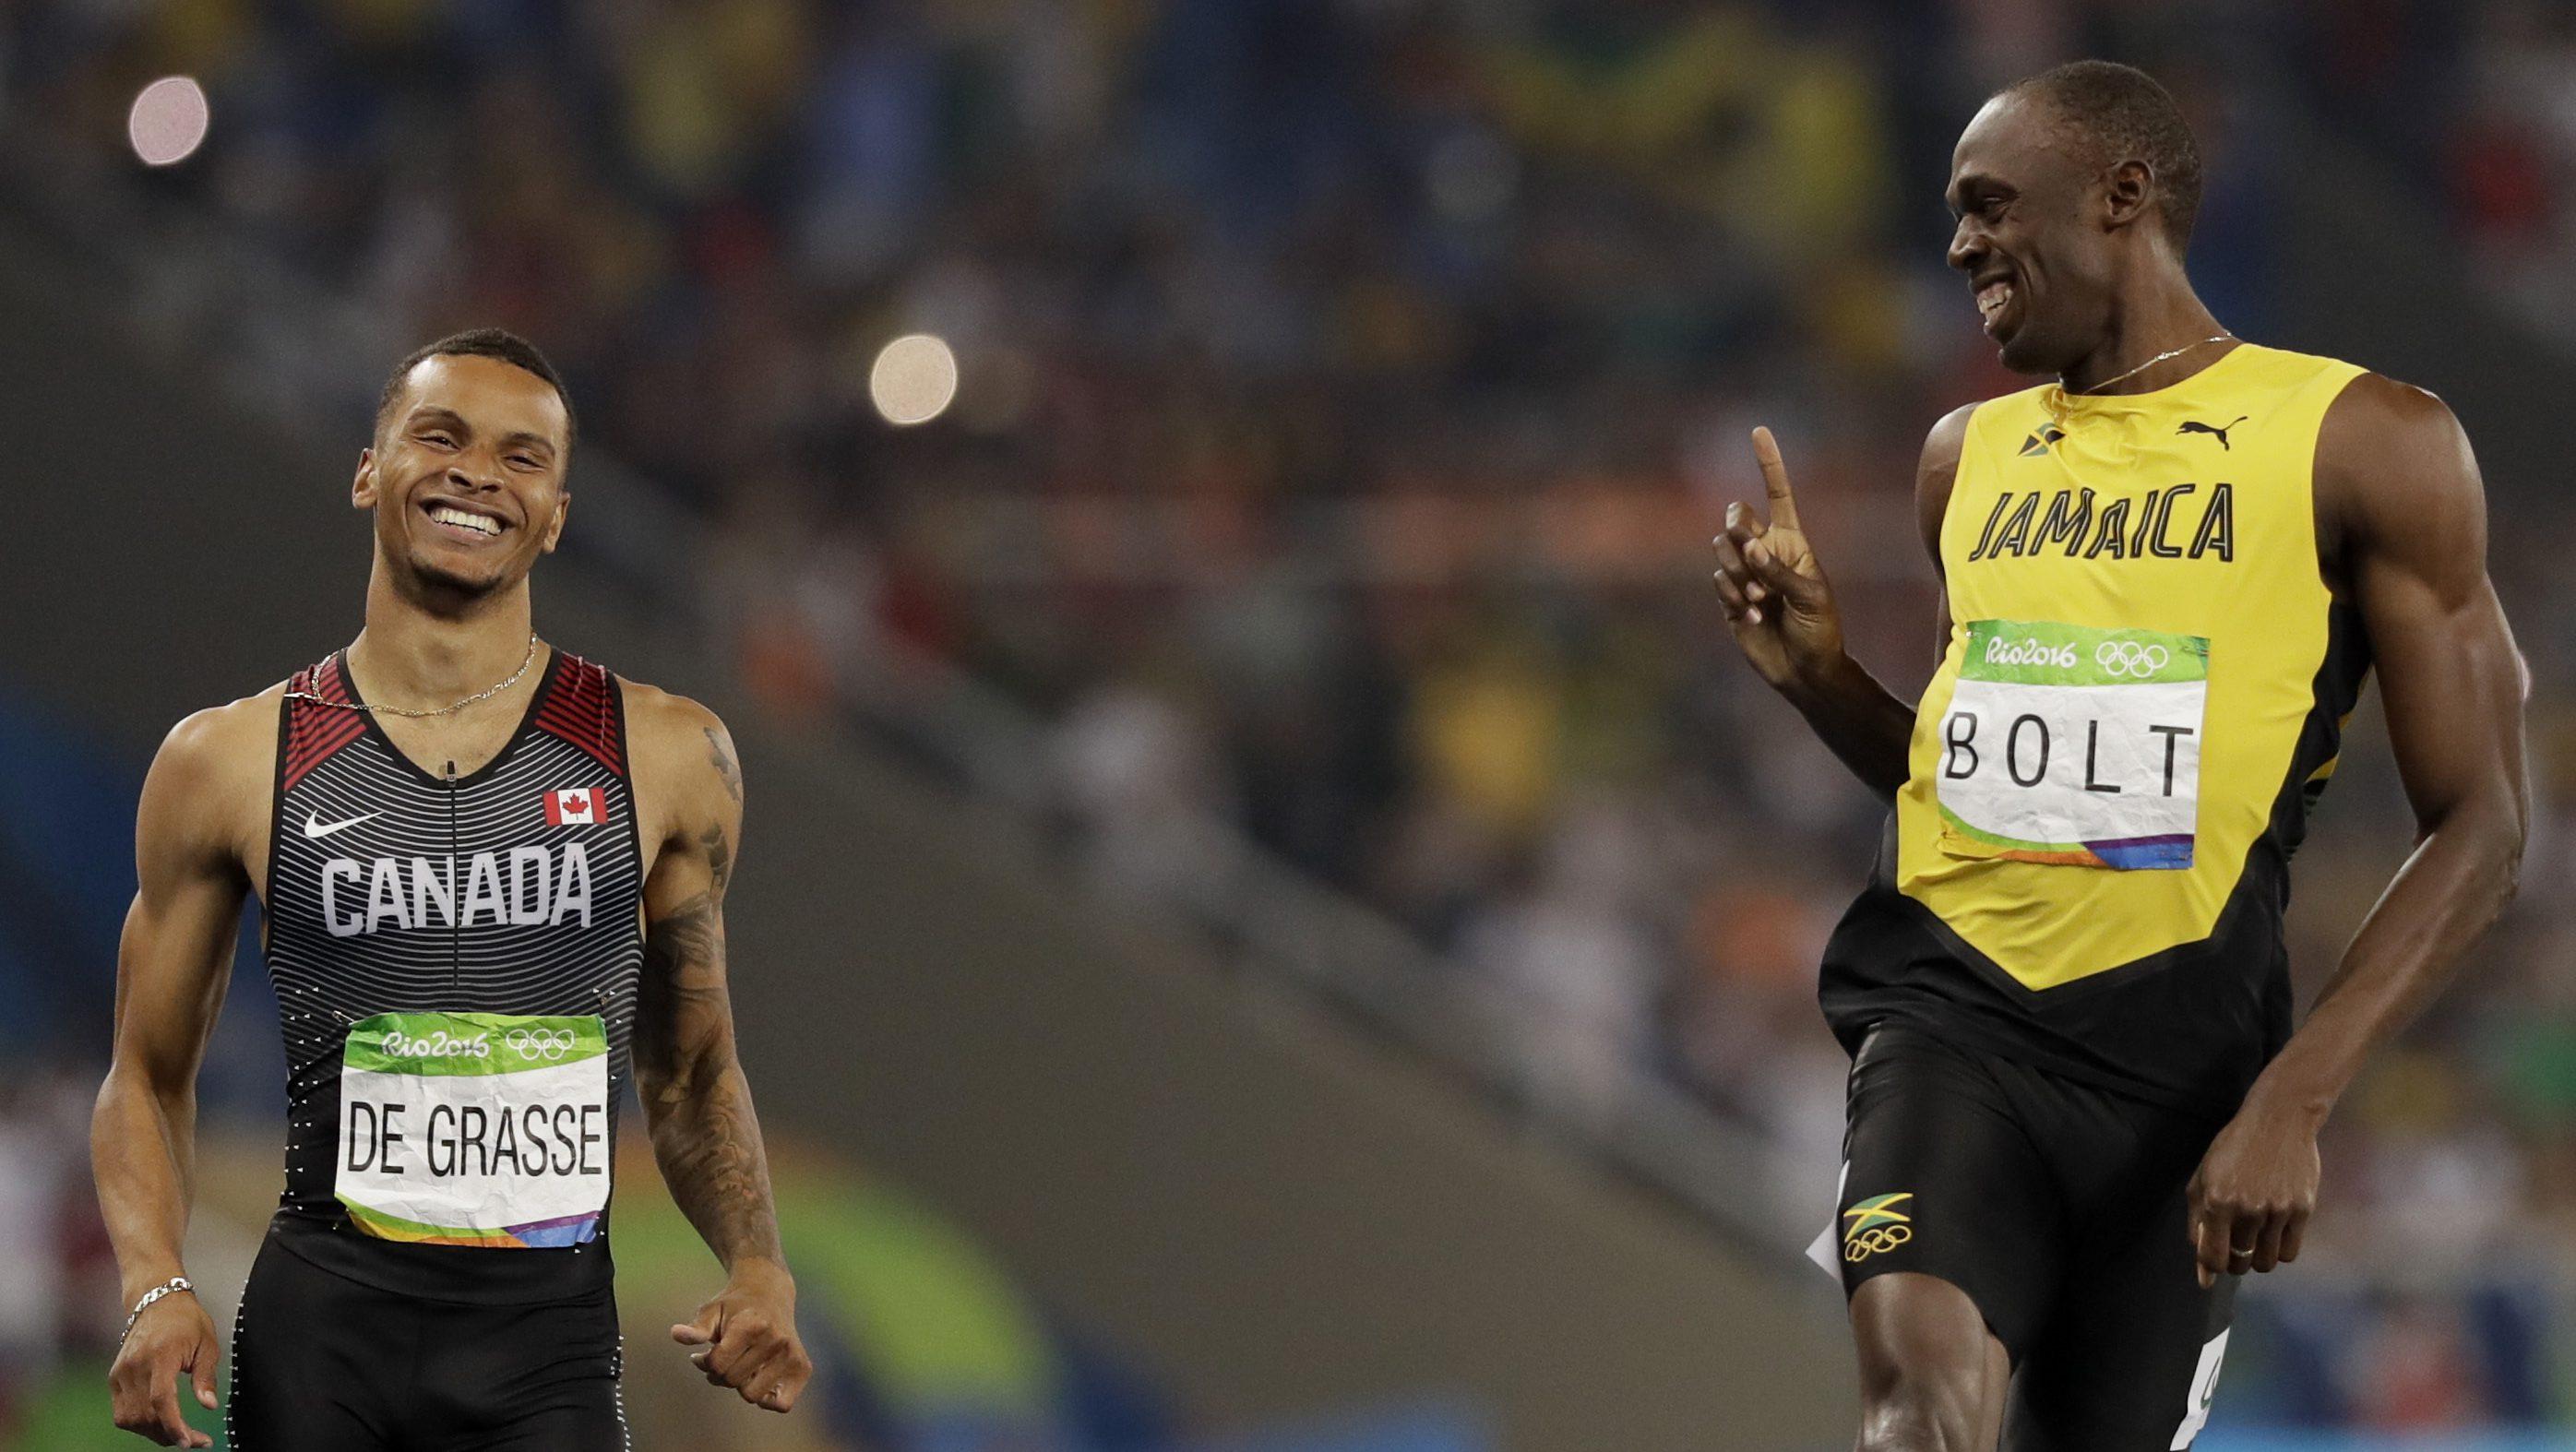 Usain Bolt, Andre De Grasse